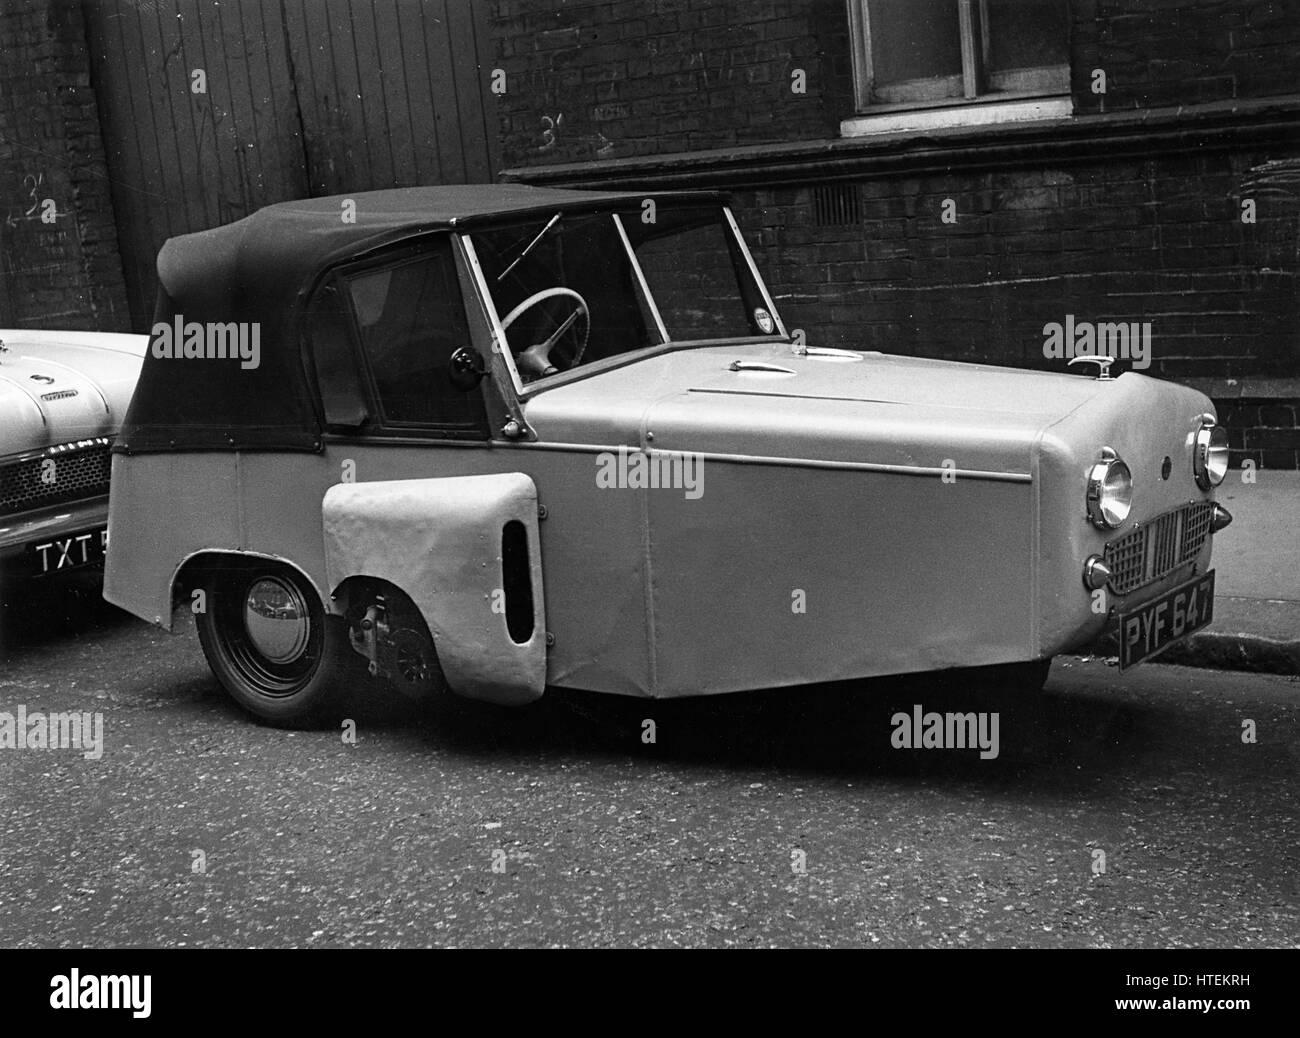 1956 Gordon 197cc 3 wheeler. - Stock Image